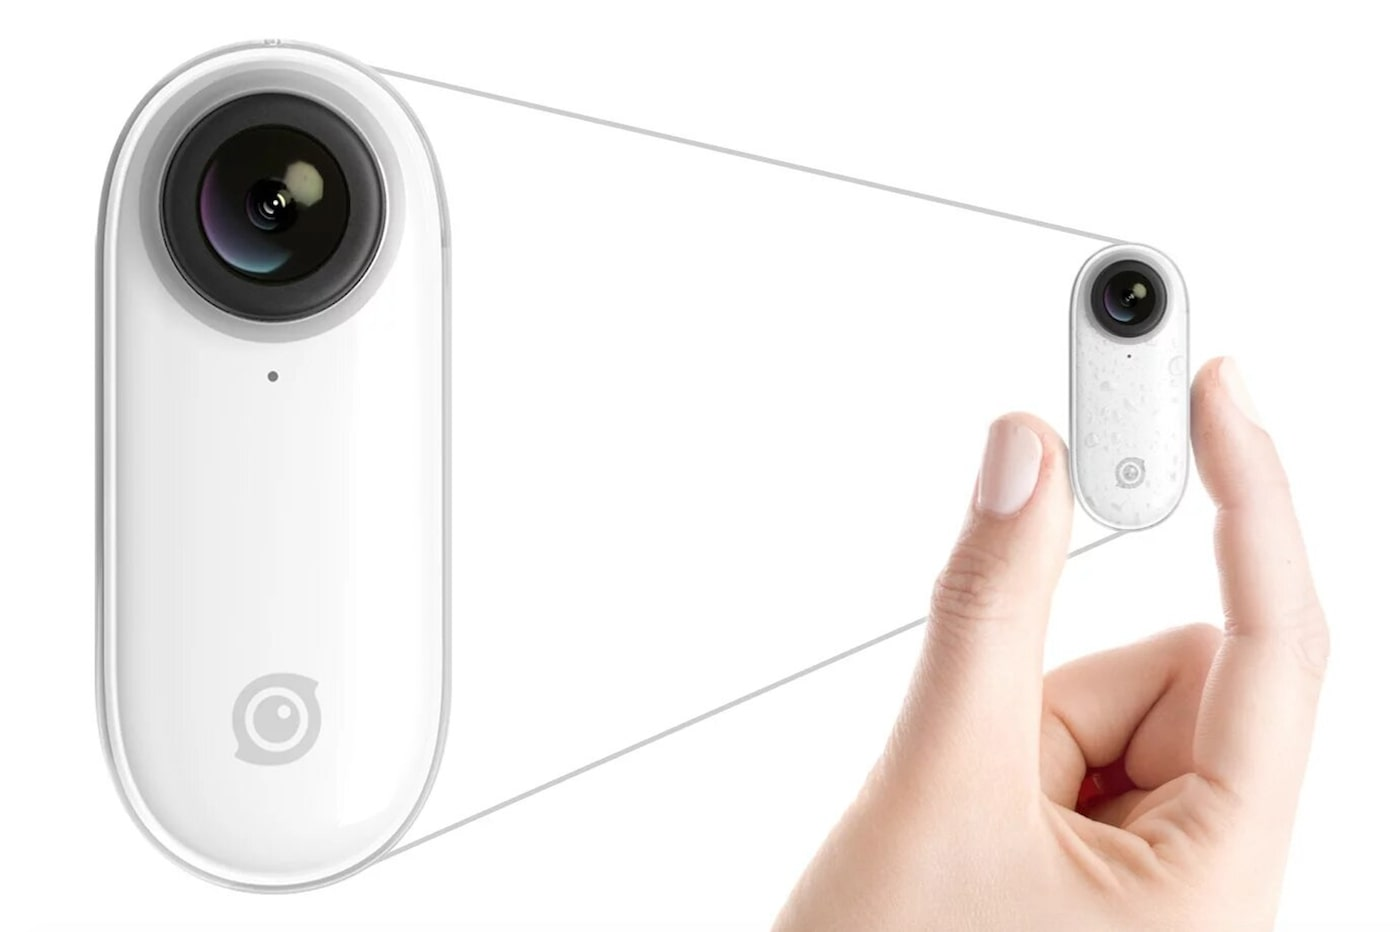 Insta360 steadycam